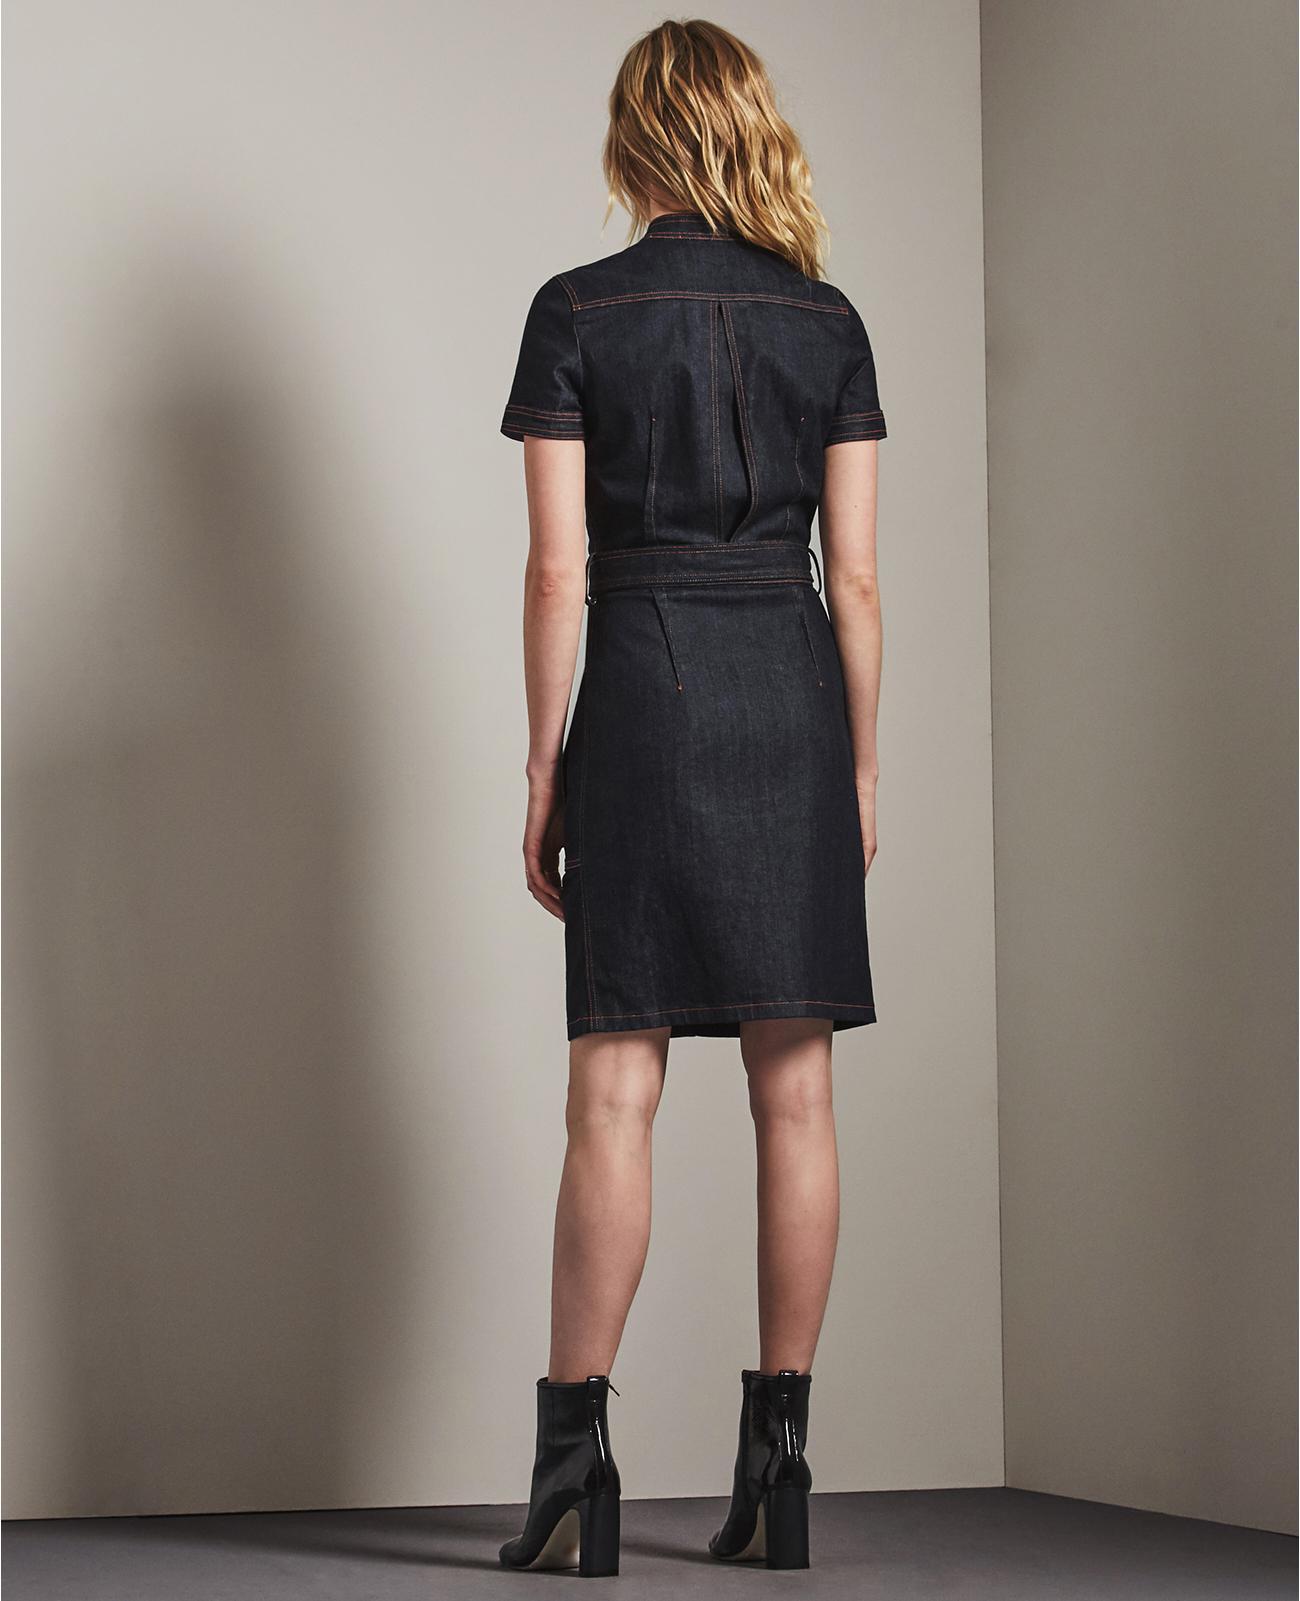 The Aurelie Dress